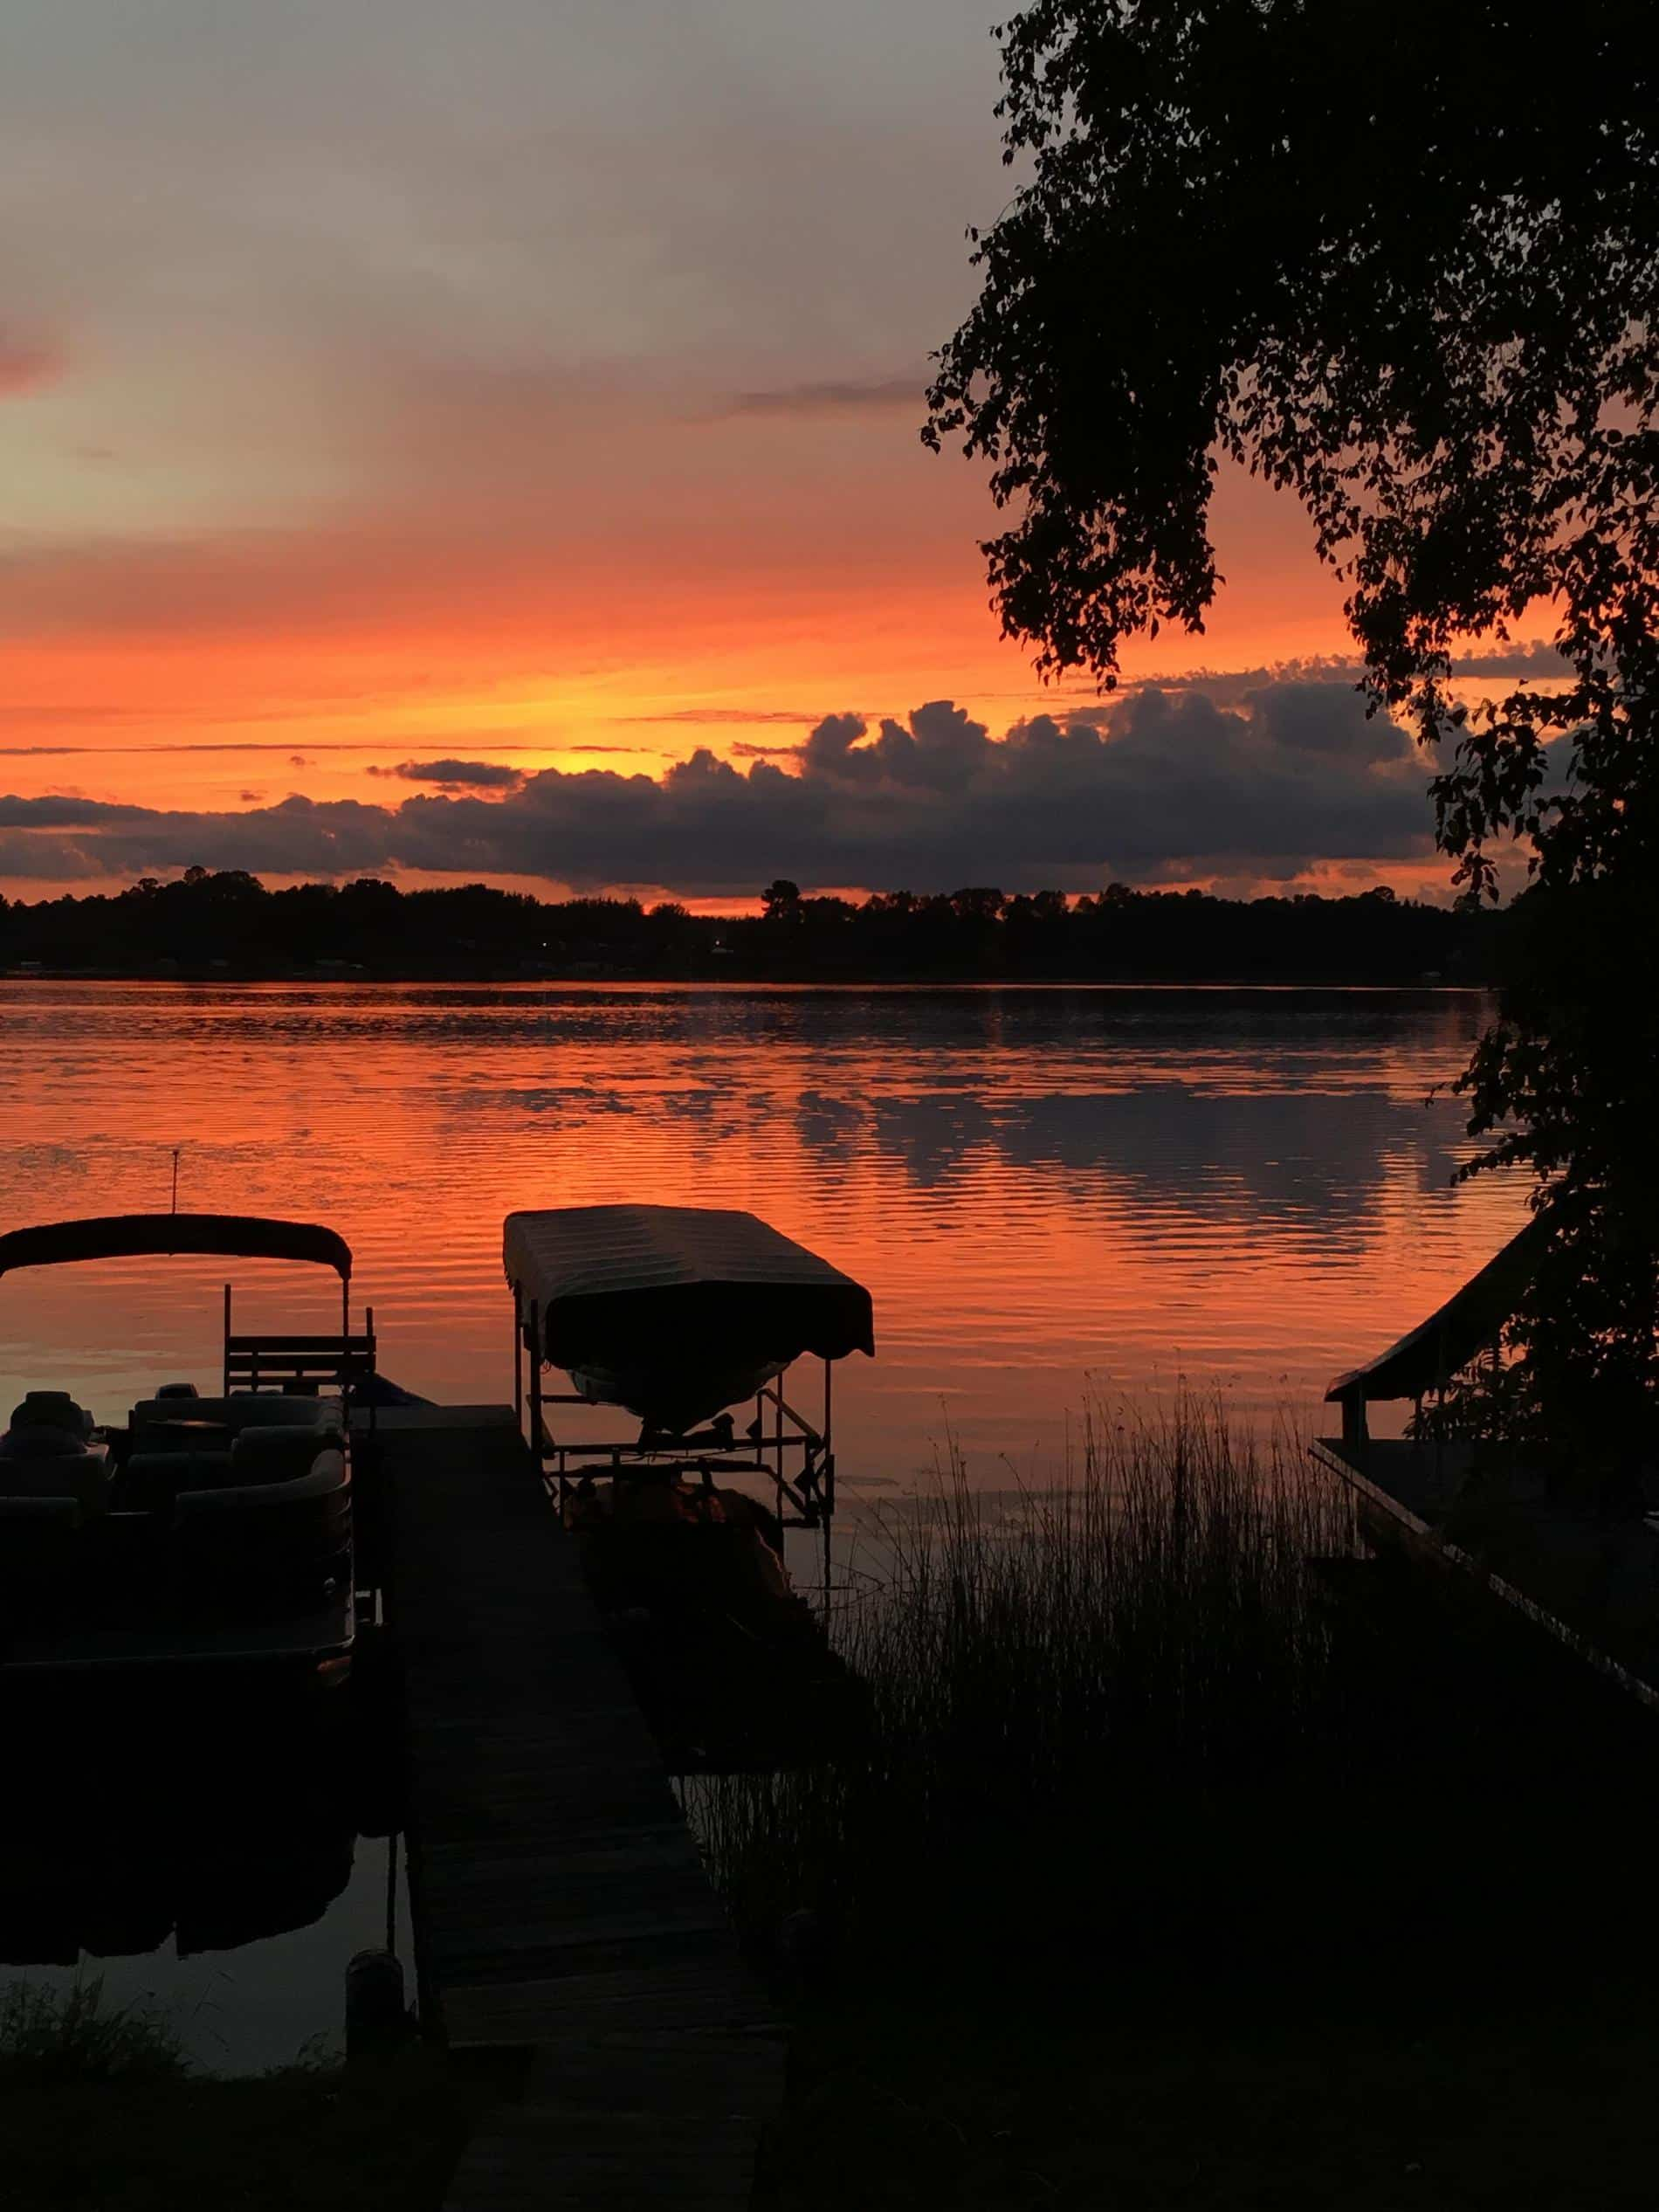 Cornell Lake Resort and Campground